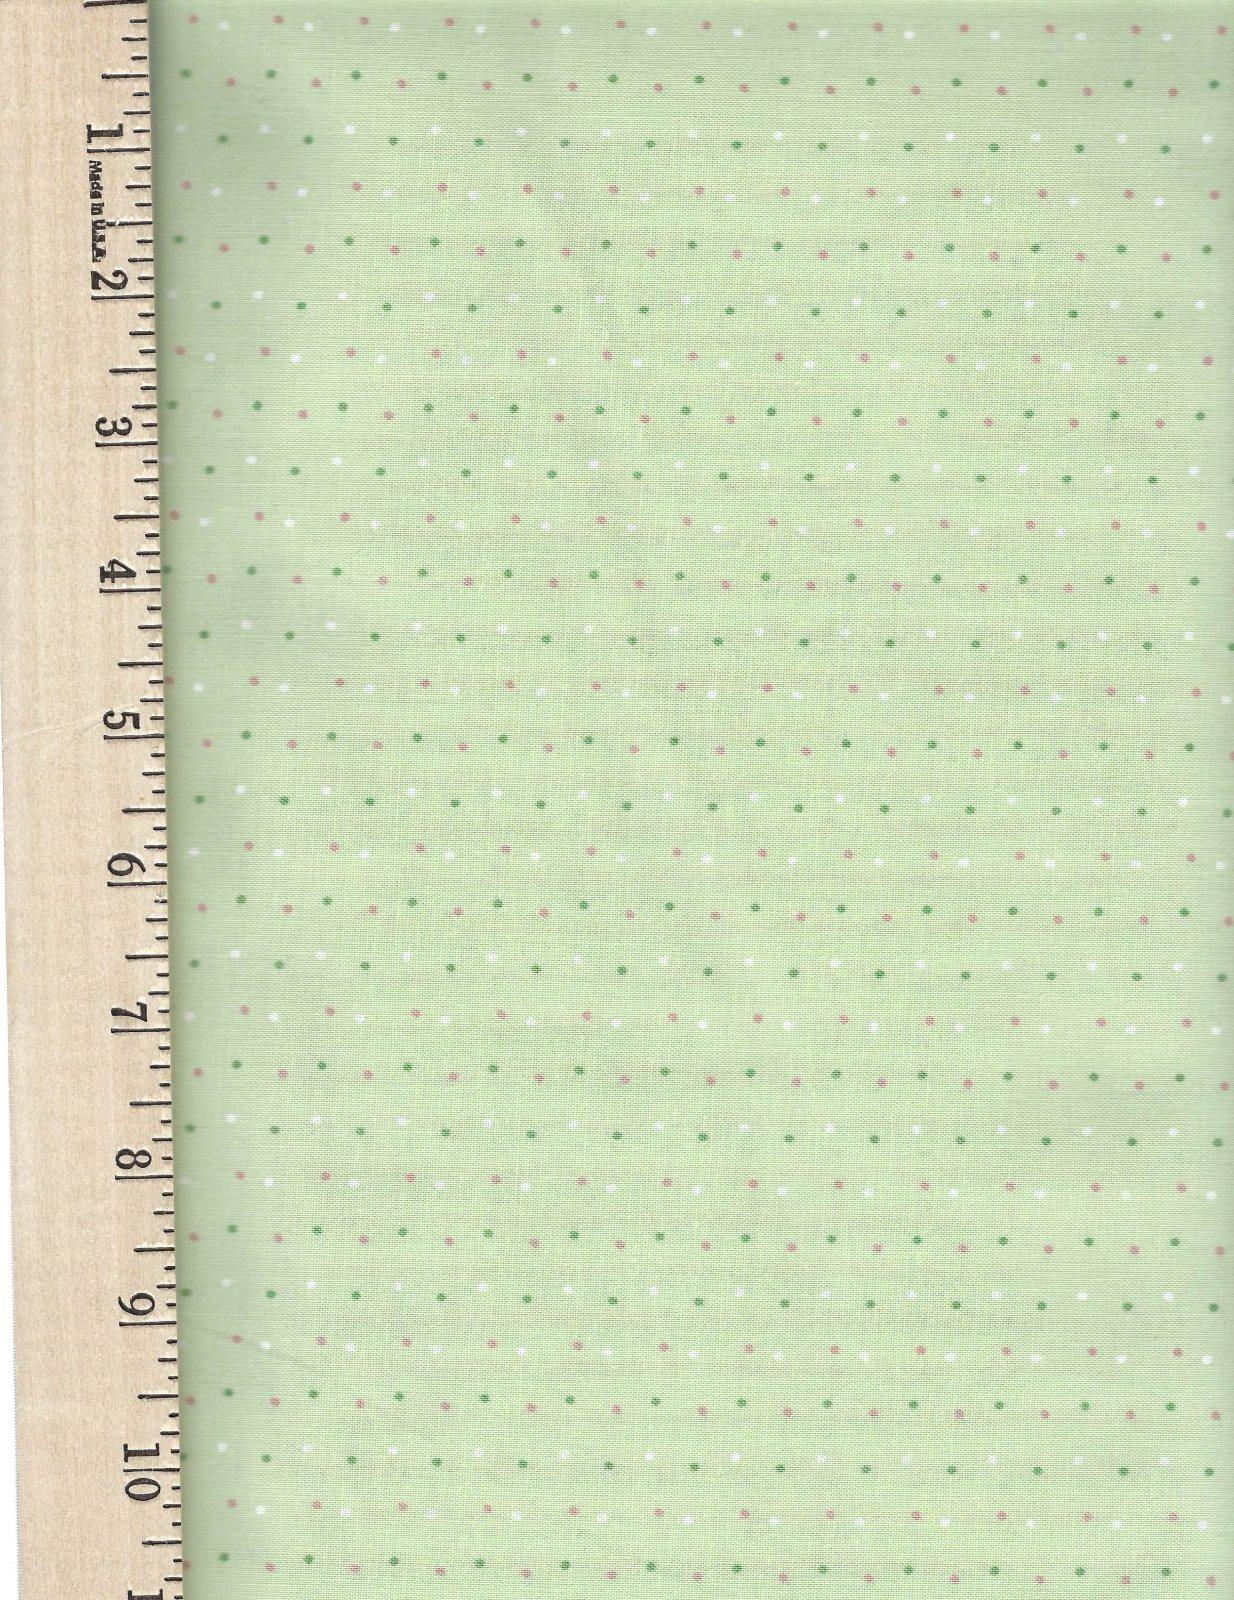 BF105 Light Green Dots